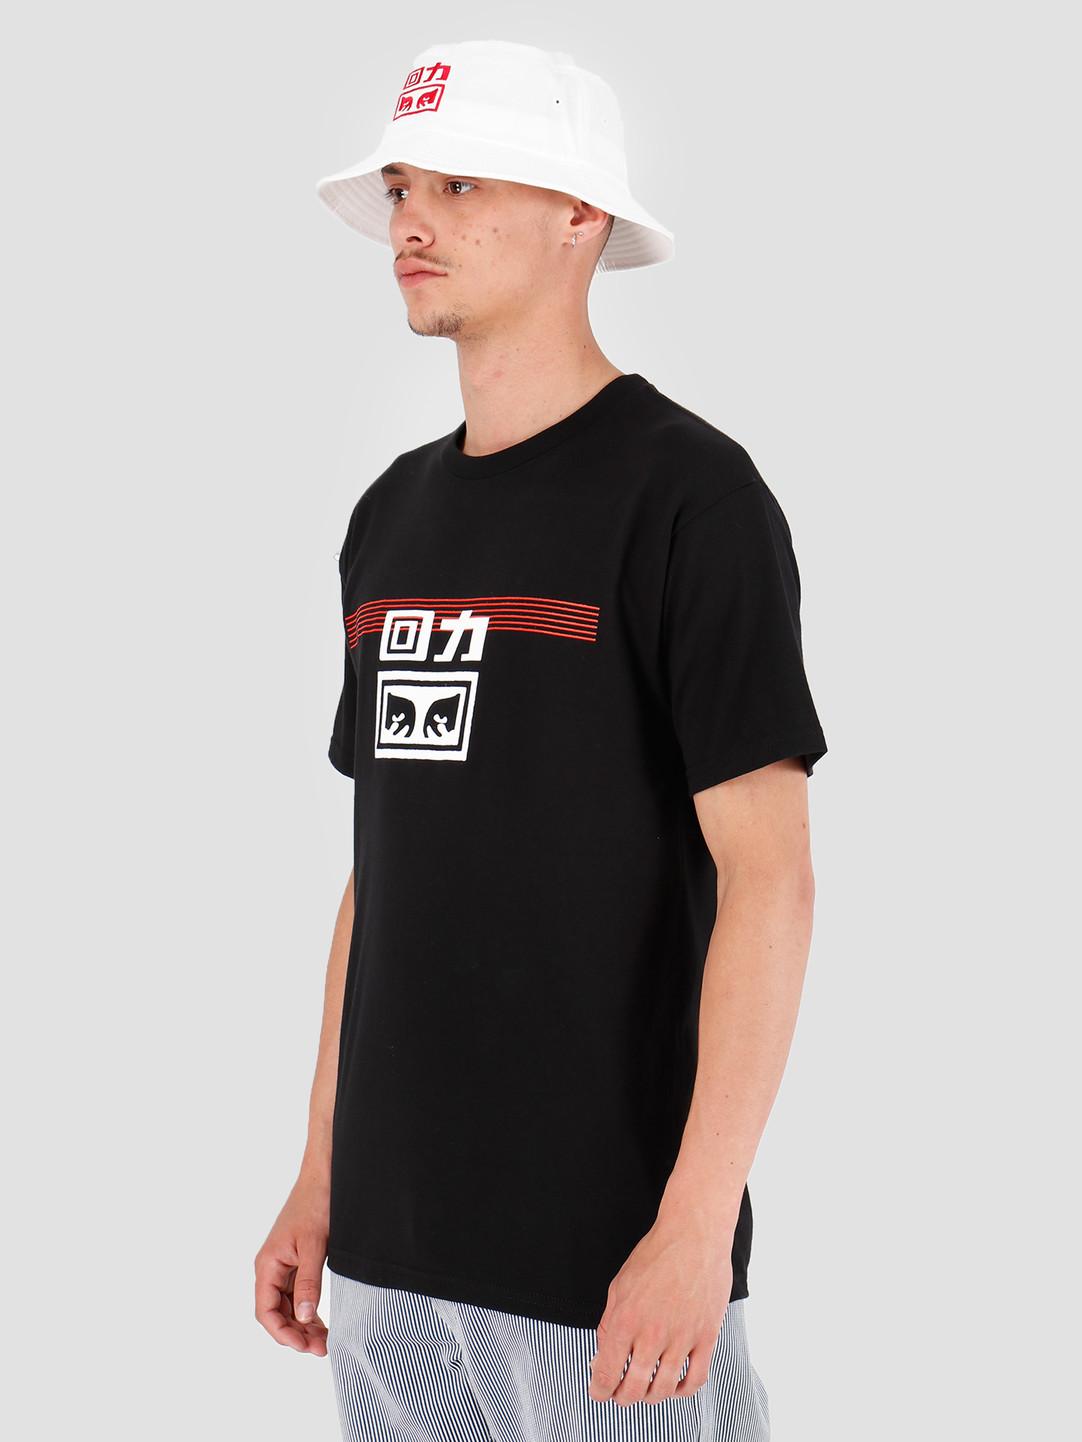 Obey Obey x Warrior T-Shirt Black 163082172E-BLK